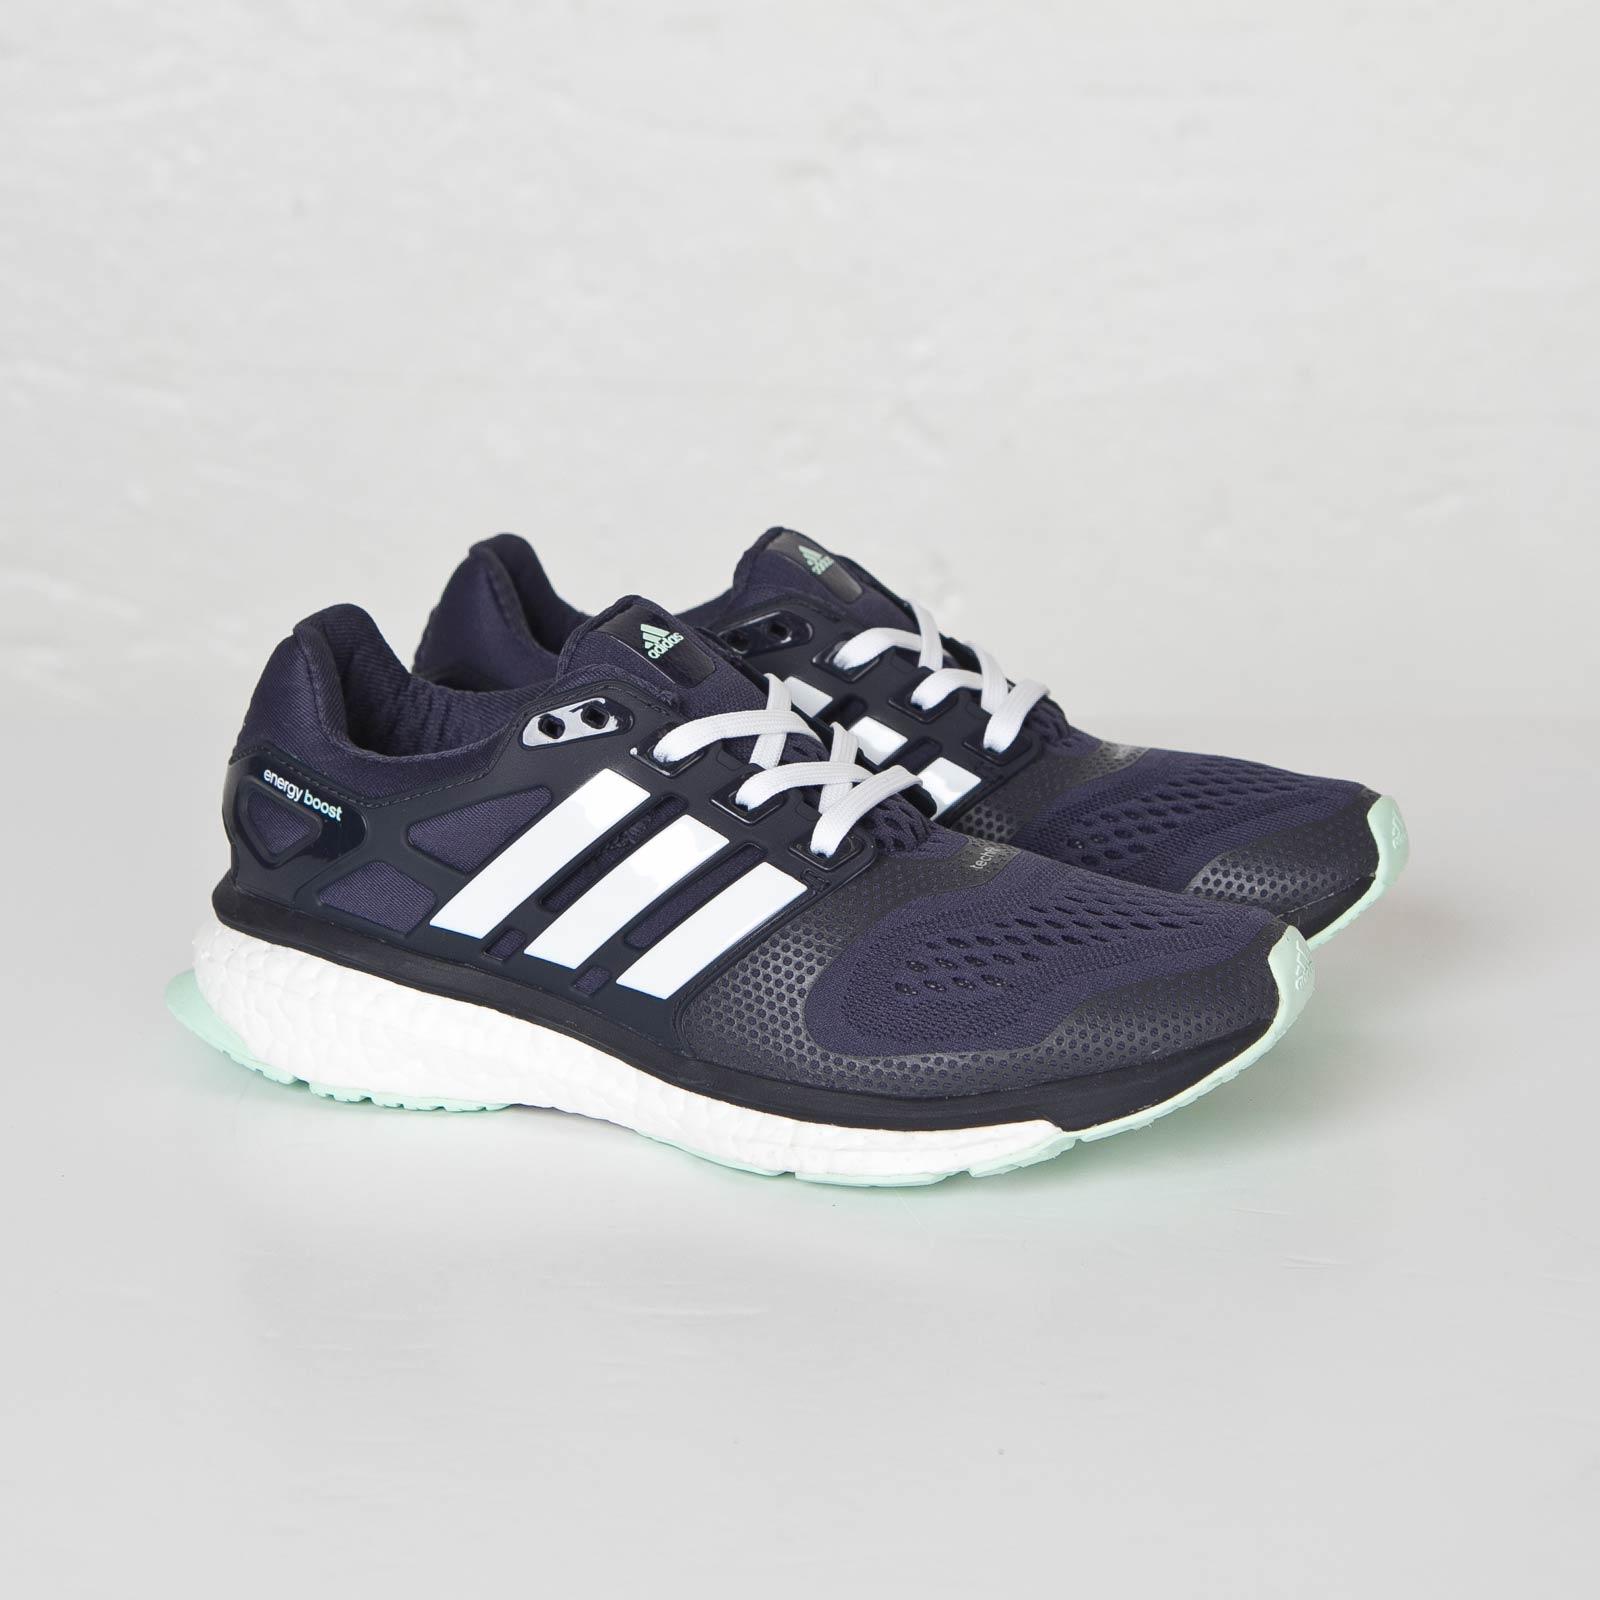 sufrir síndrome patrón  adidas energy boost ESM w - S77551 - Sneakersnstuff | sneakers & streetwear  online since 1999